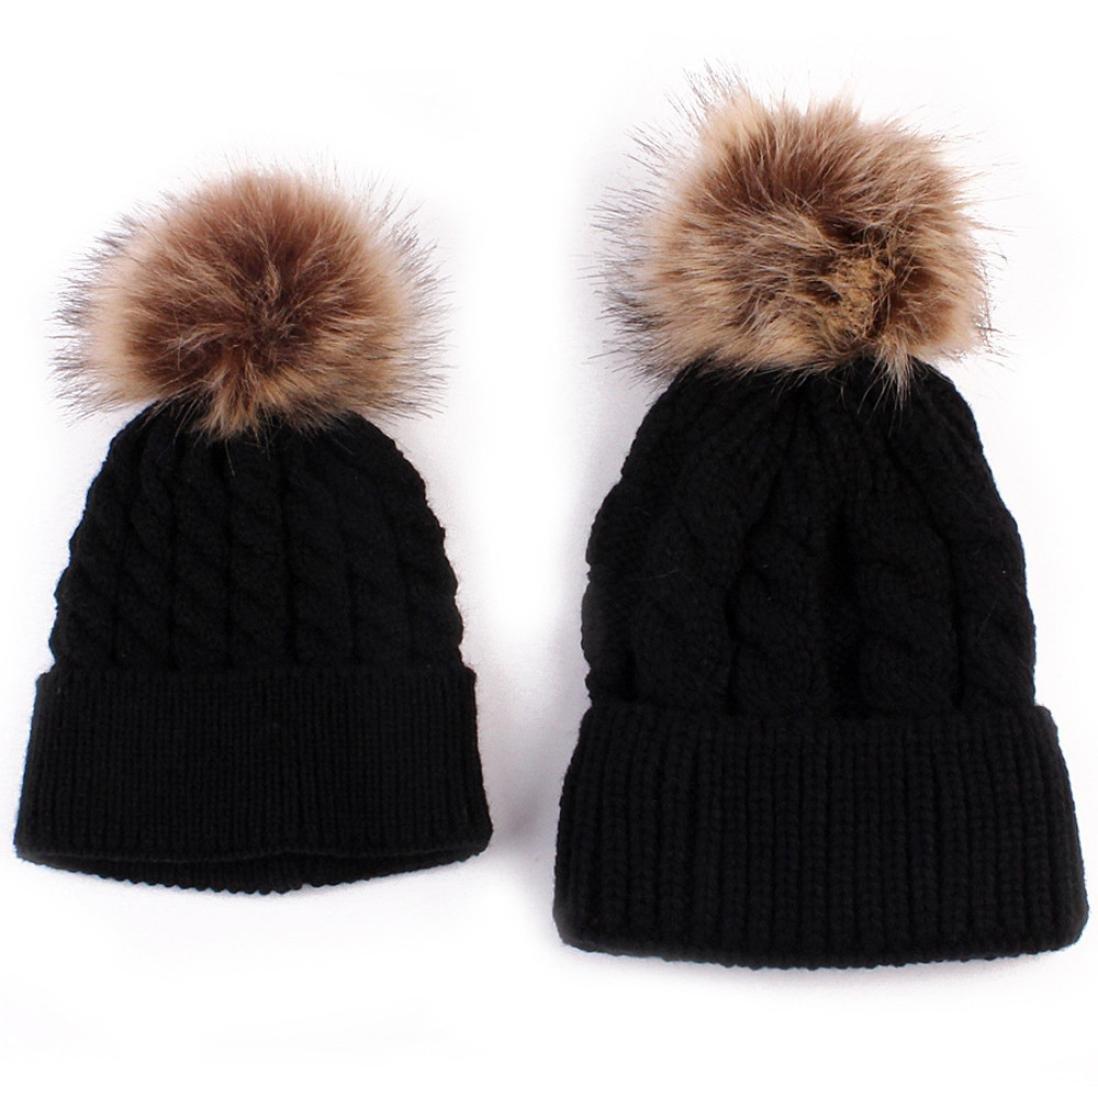 Amazon.com   Sunbona Mom and Baby Matching Knitting Hat Cap Winter Warm  Cute Pur Pom Pom Beanie Hat (Black)   Sports   Outdoors 501bd48d0b1